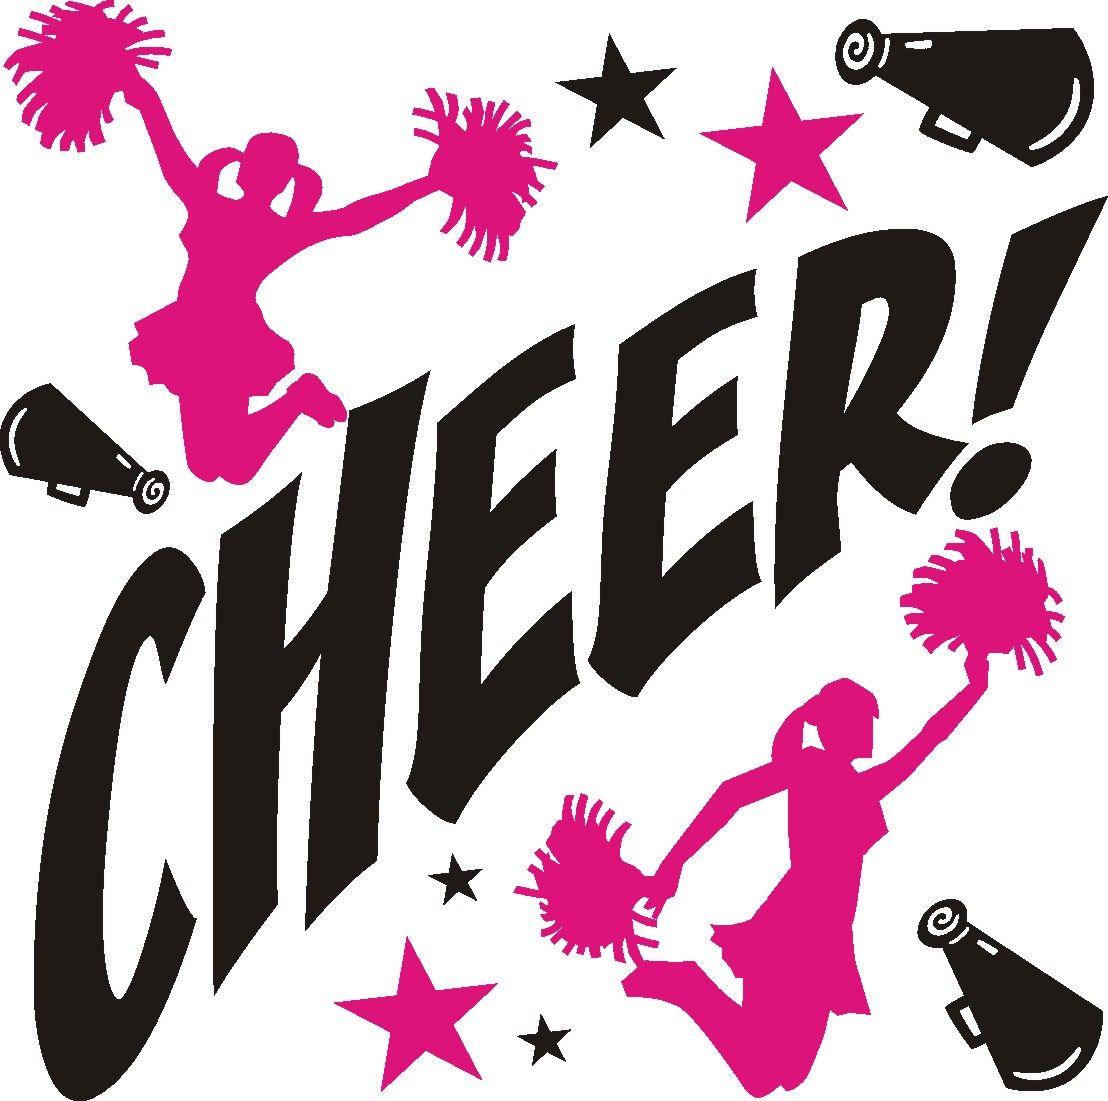 1108x1101 Cheerleader Cheerleading Clipart Stunts Free Images 3 Silhouette